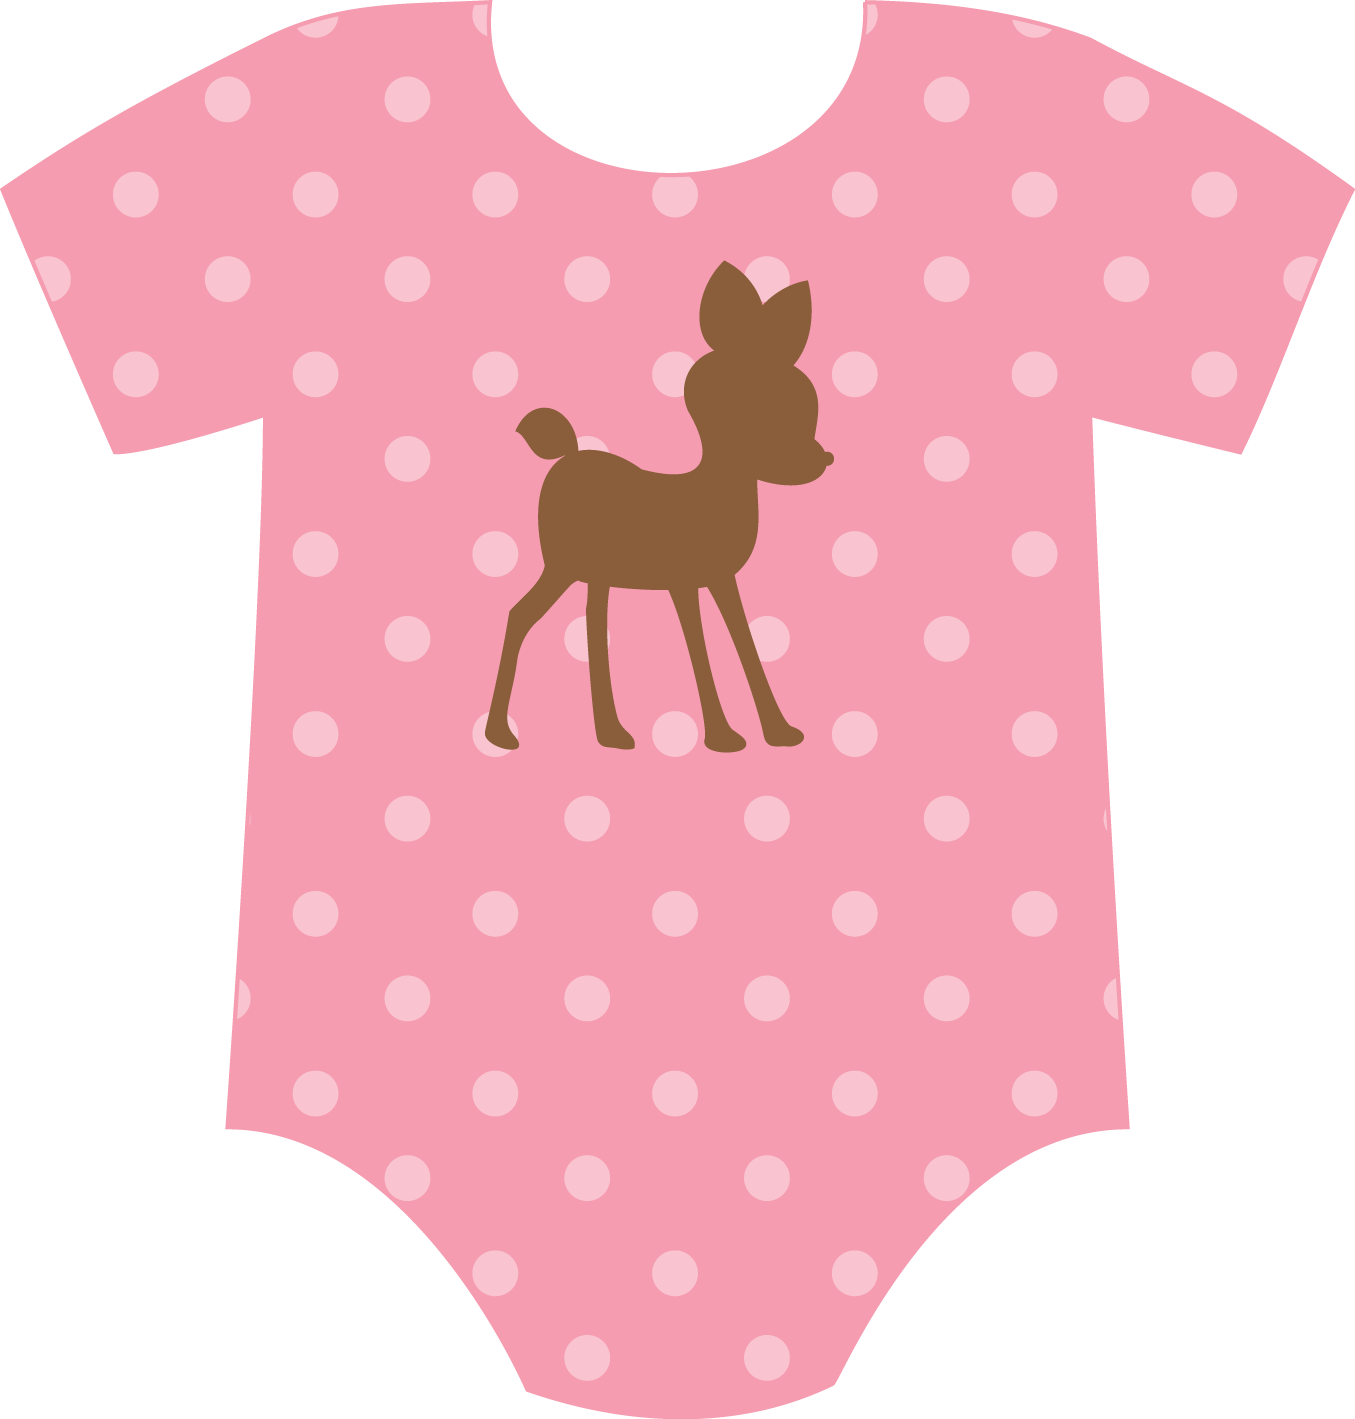 Clipart de Bodies de Bebé. | Oh My Bebé!